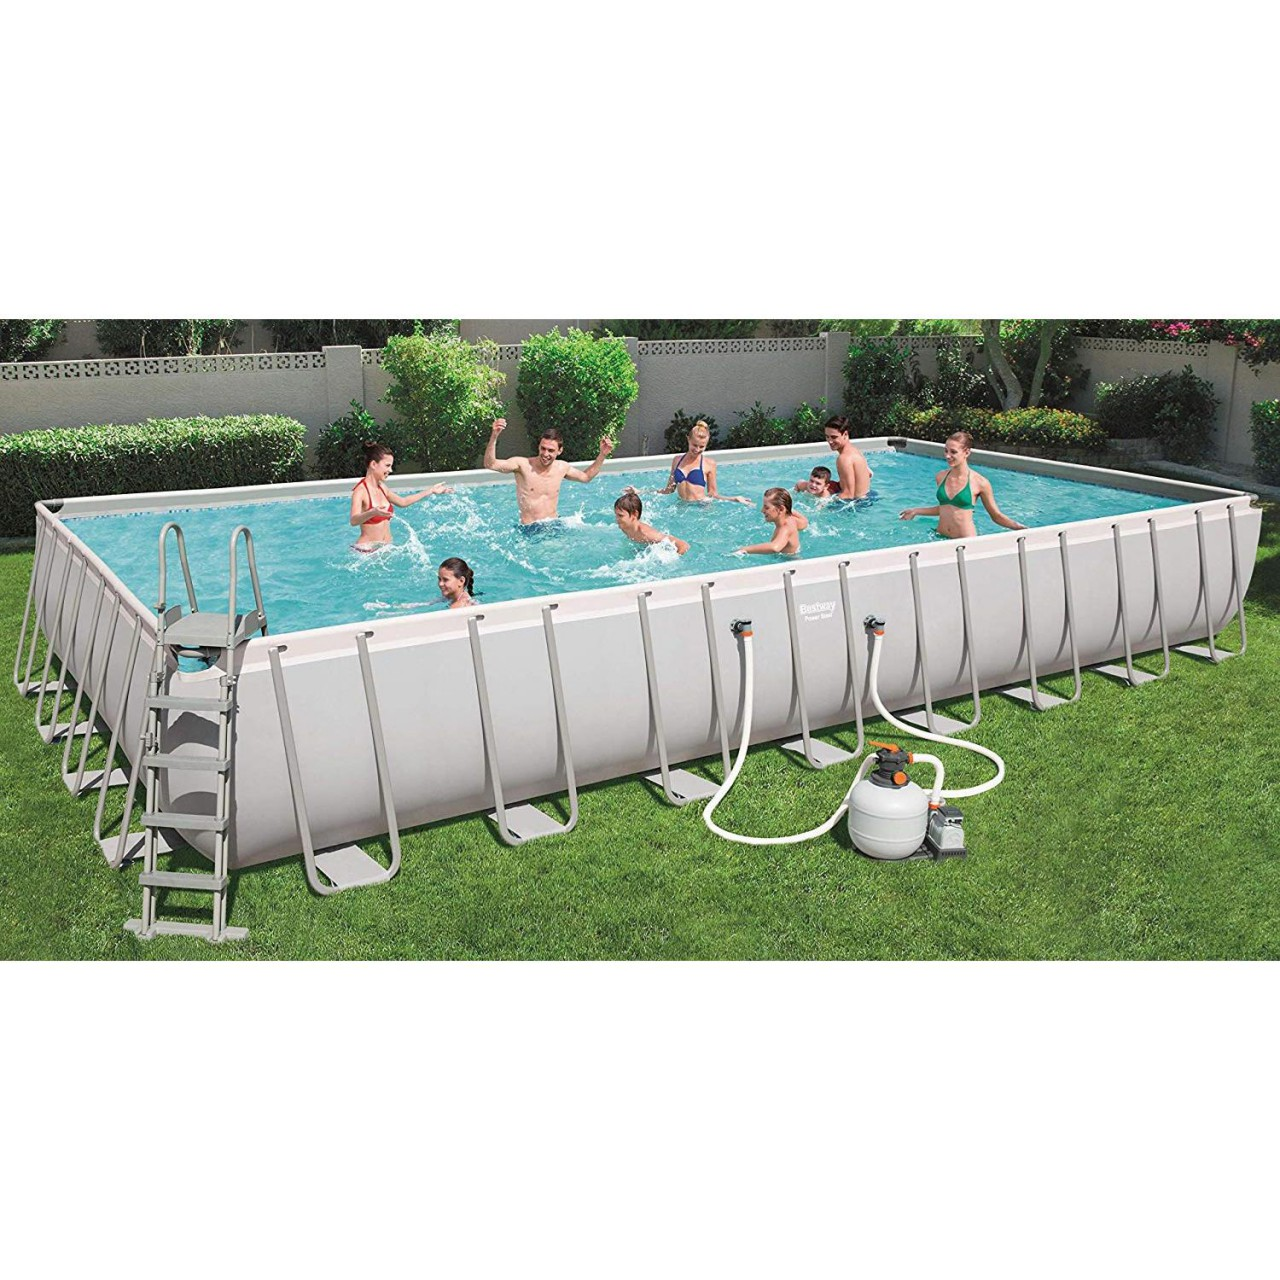 Bestway 56623 Power Steel Rectangular Pool Set 956x488x132 cm